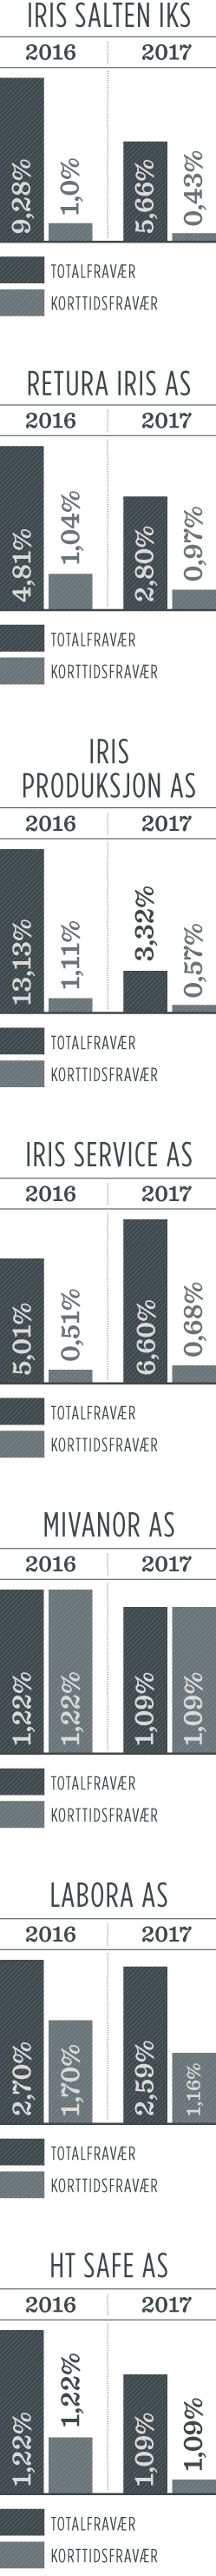 Sykefravær 2017